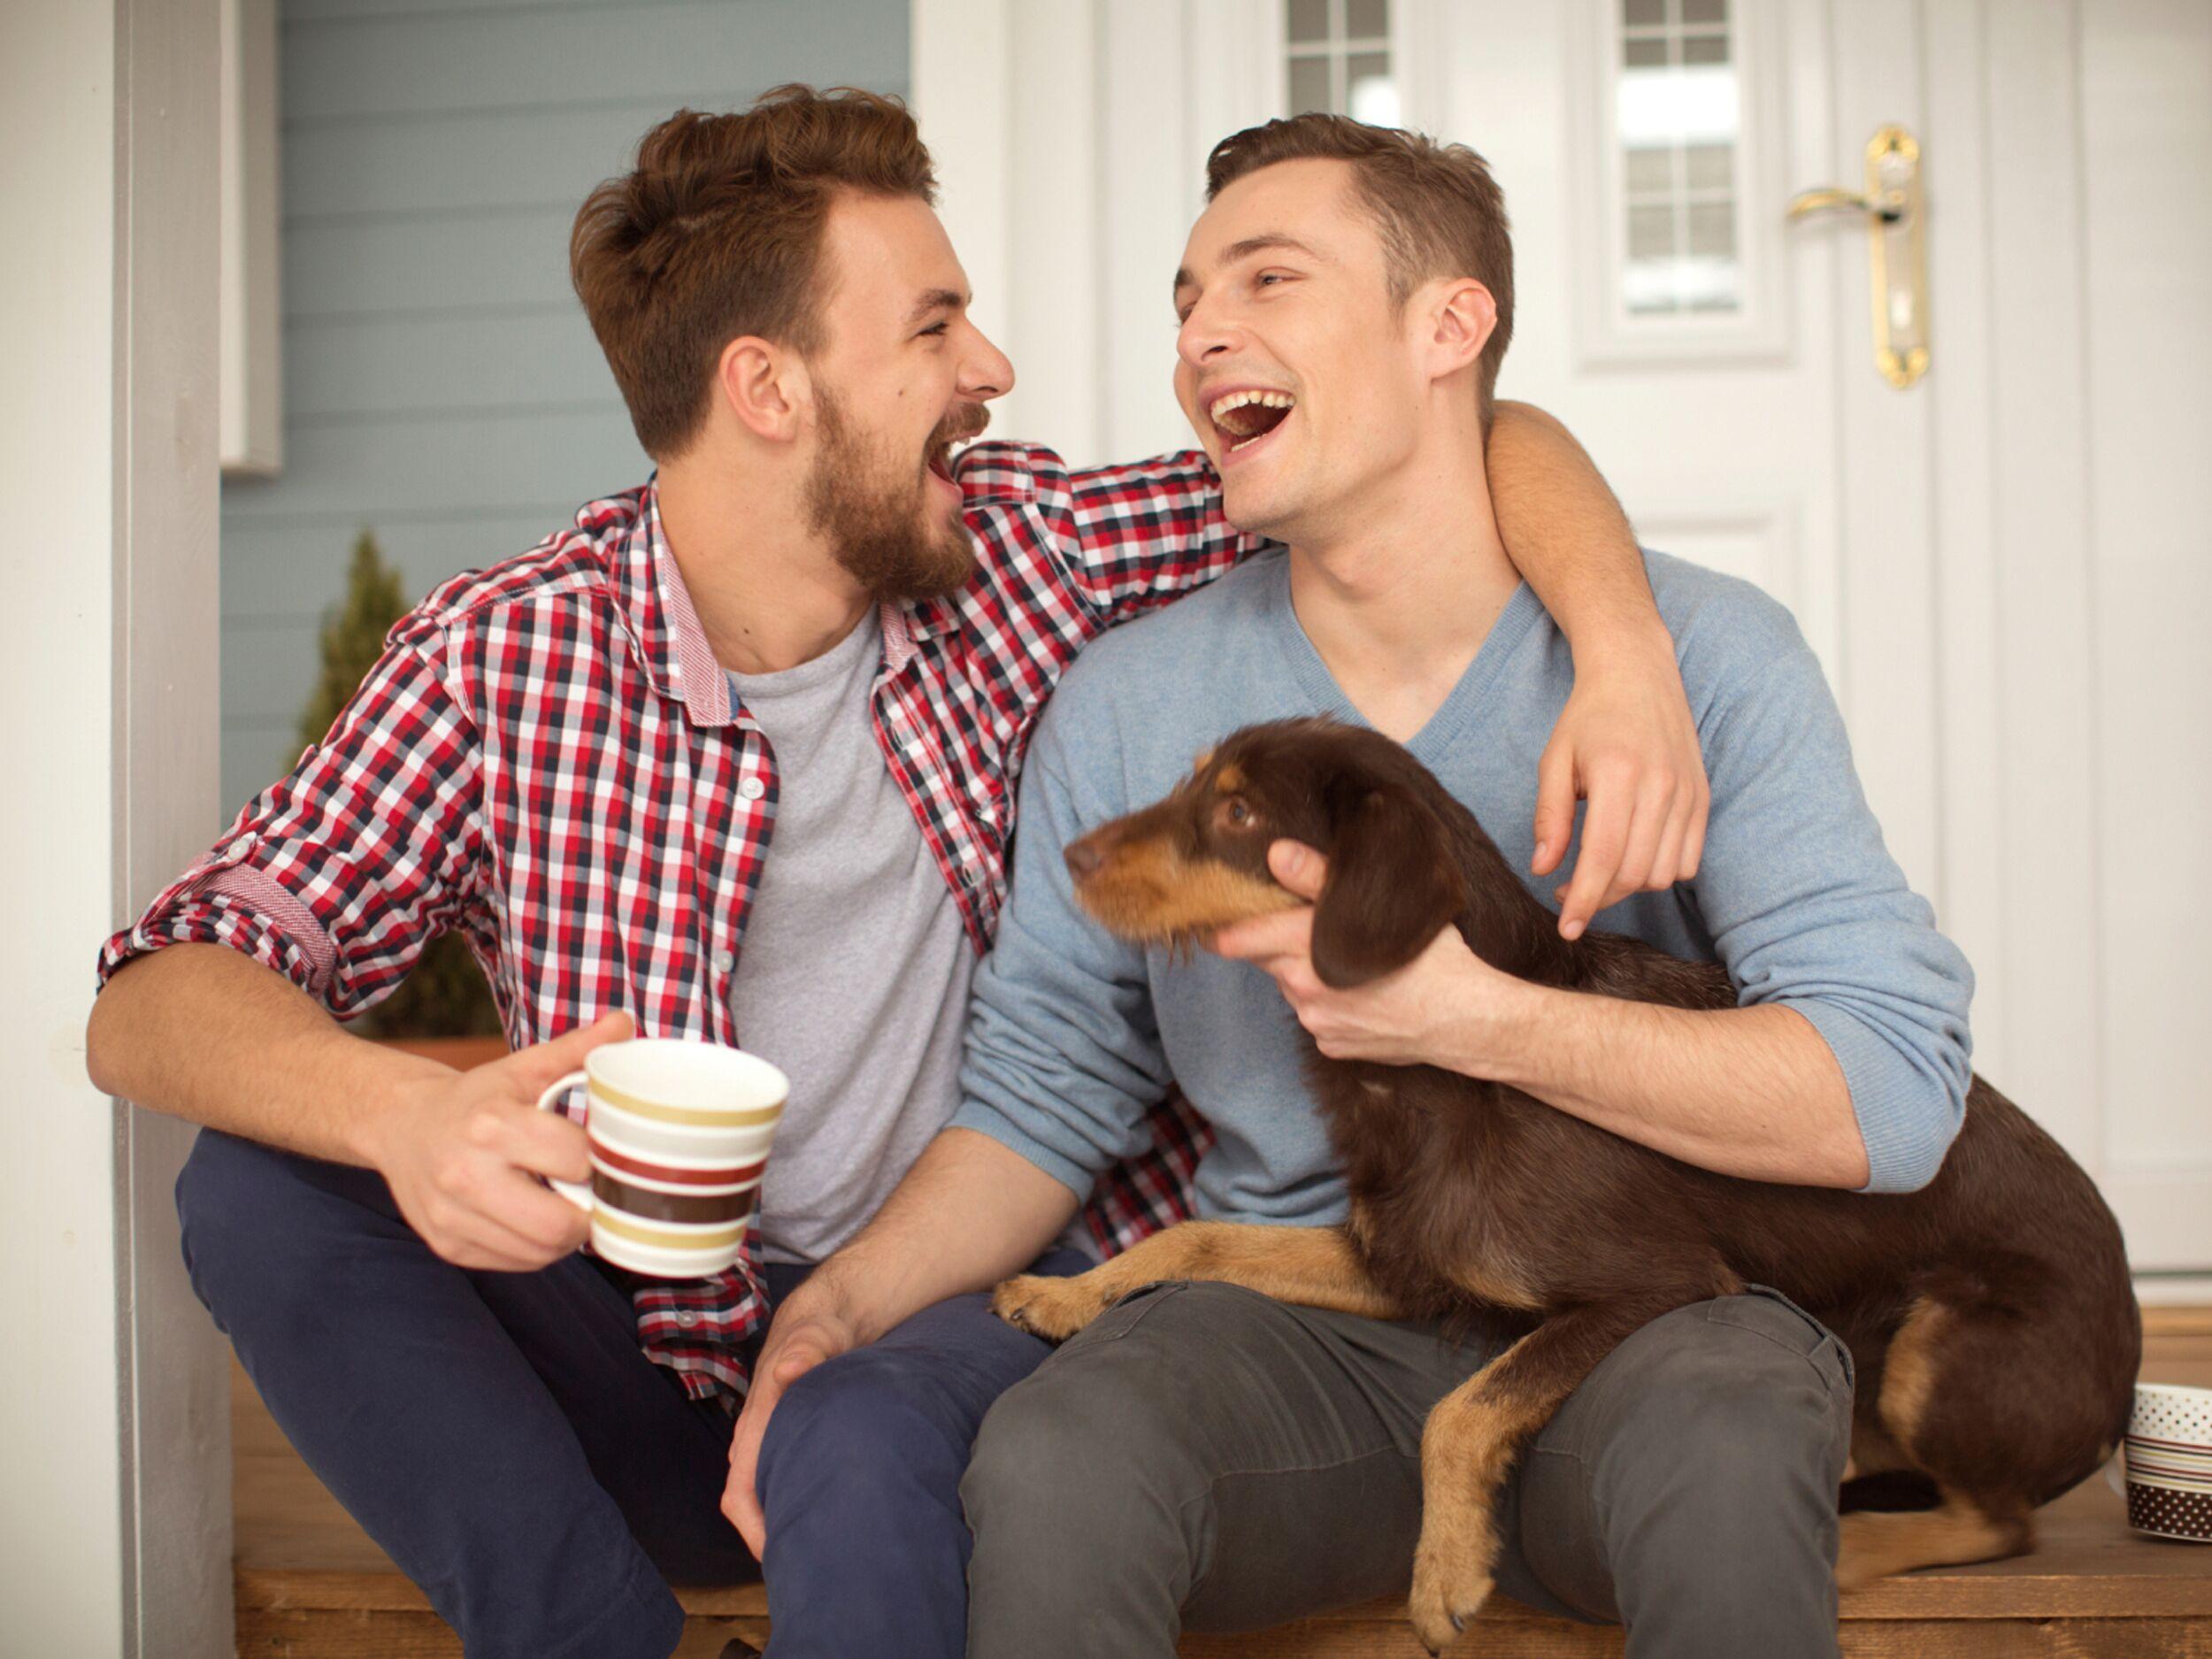 Gay Marriage Last Name Change Advice-6258